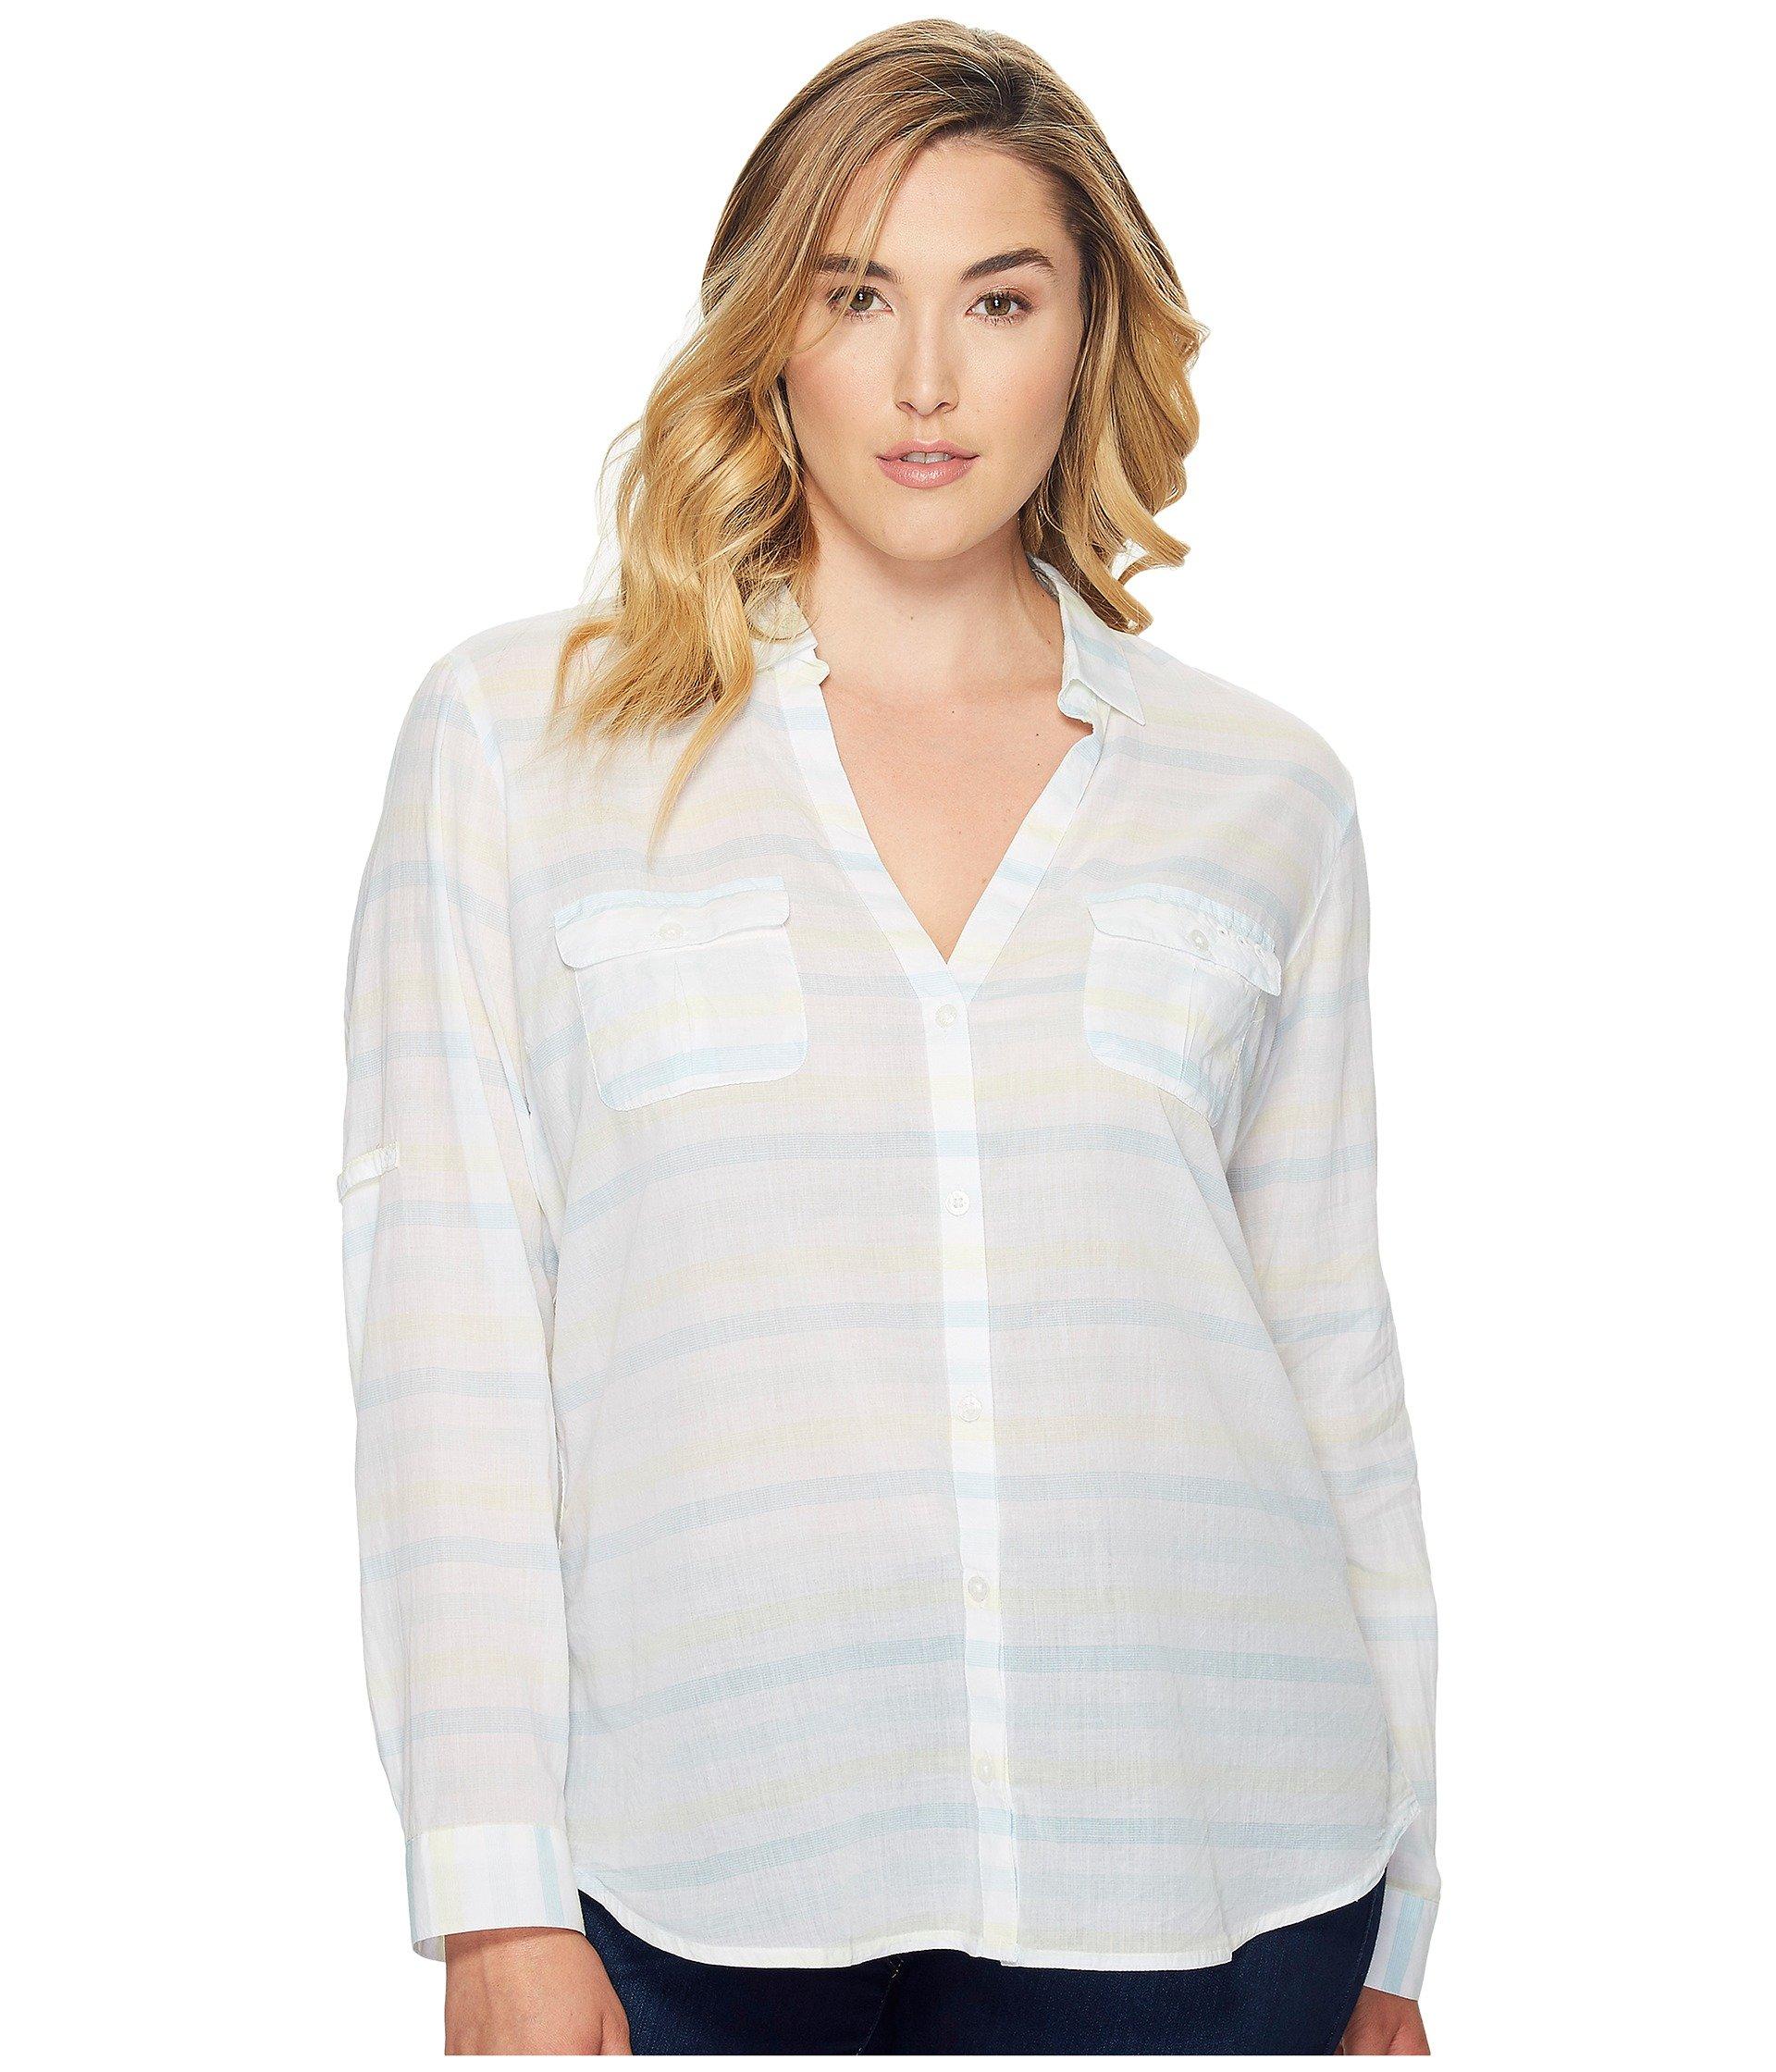 Blusa para Mujer Columbia Plus Size Sun Drifter™ Long Sleeve Shirt  + Columbia en VeoyCompro.net